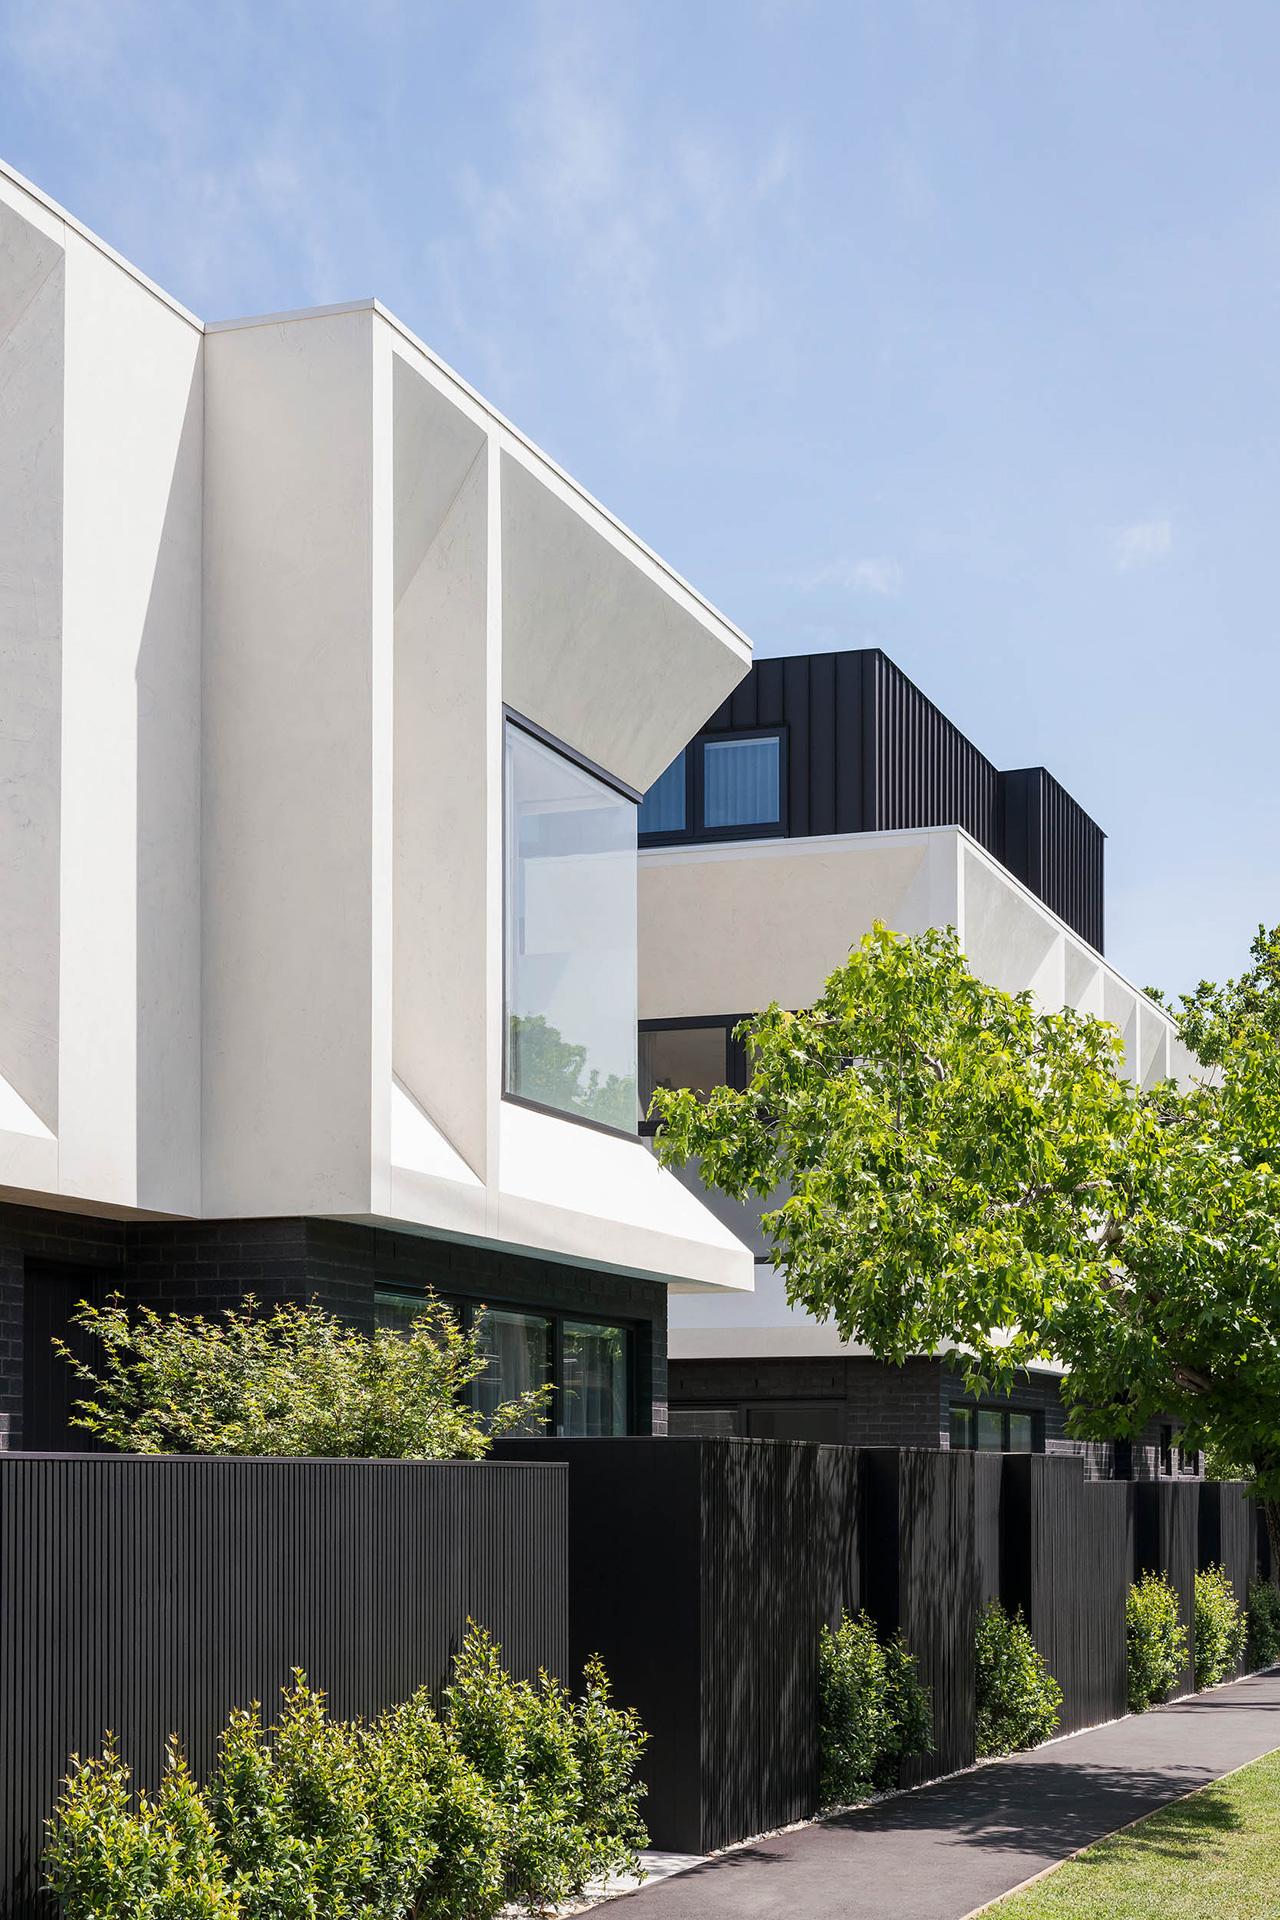 external-facade-daytime-angles-elwood-multi-res-development-ckarch